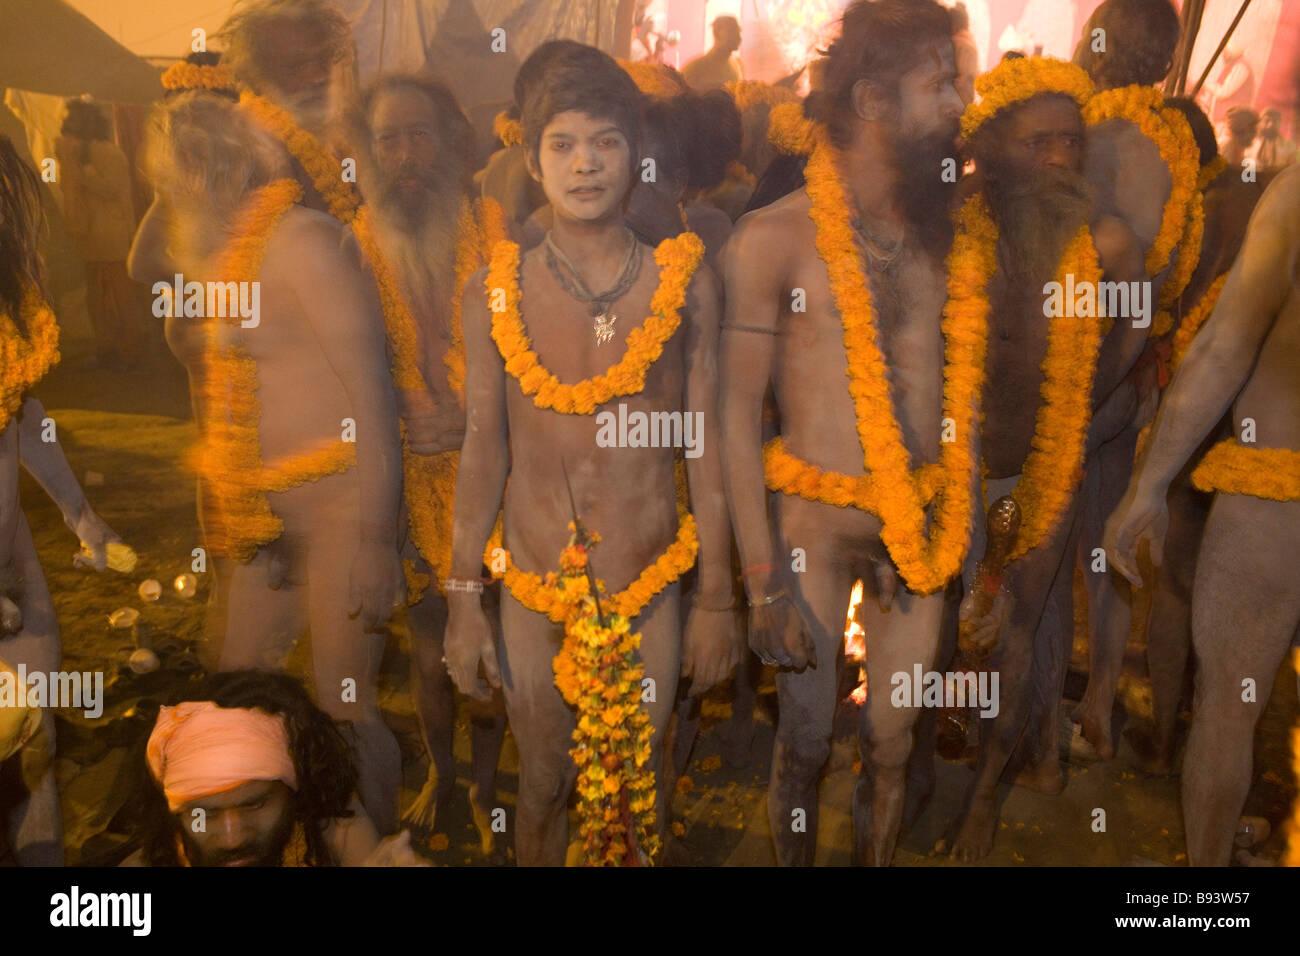 Naga Sadhus preparing for bathing in The holy river Ganges at Kumbh Mela Festival Allahabad, India - Stock Image